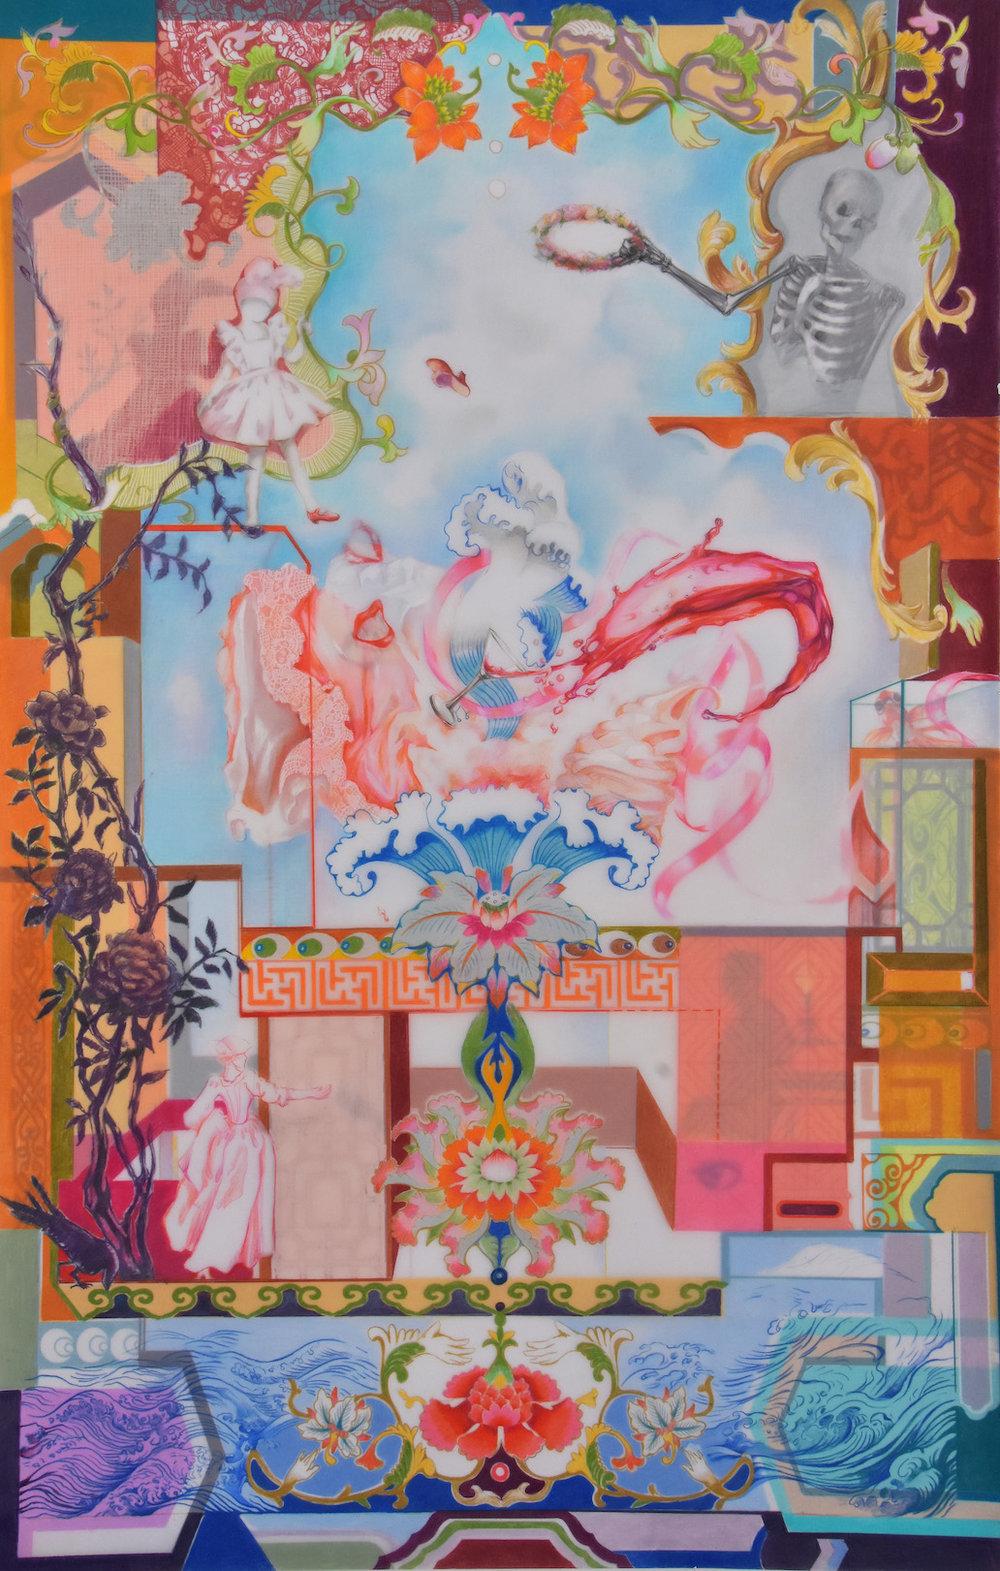 Luzhen Qiu's Fragonard's temptation 36x24.jpg